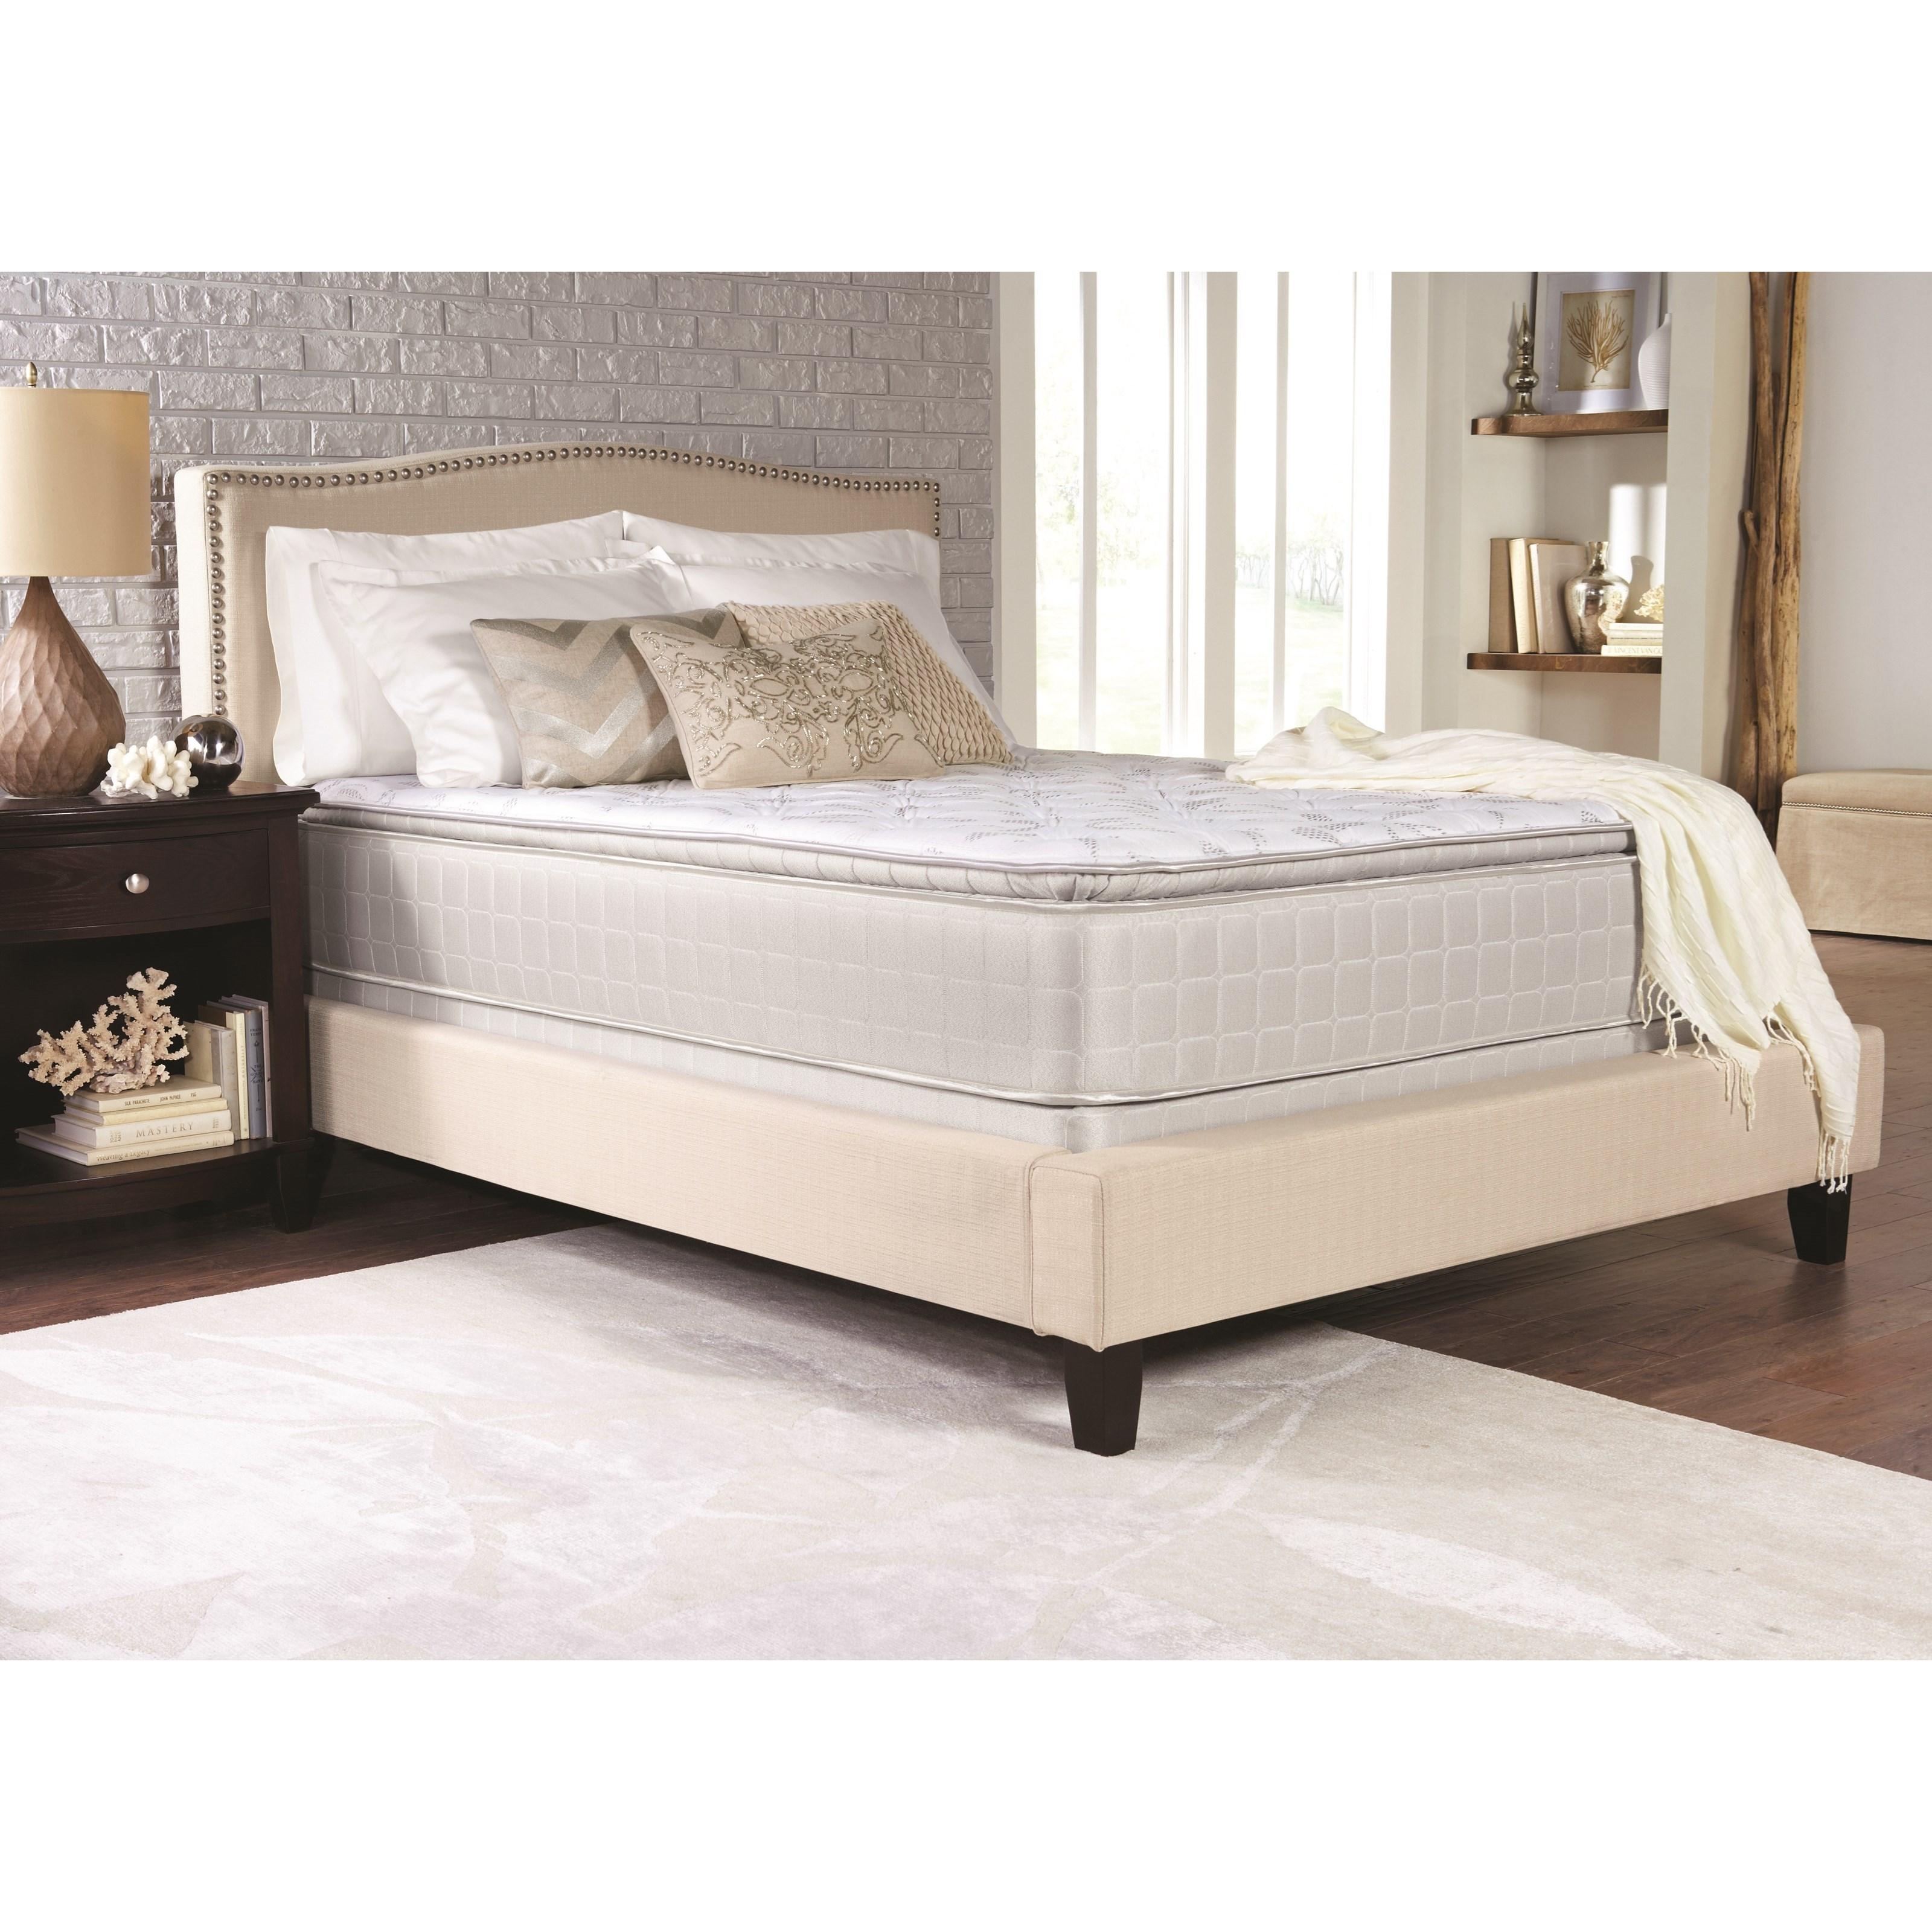 "Coaster Marbella II Pillow Top King 13"" Pillow Top Mattress - Item Number: 350055KE"